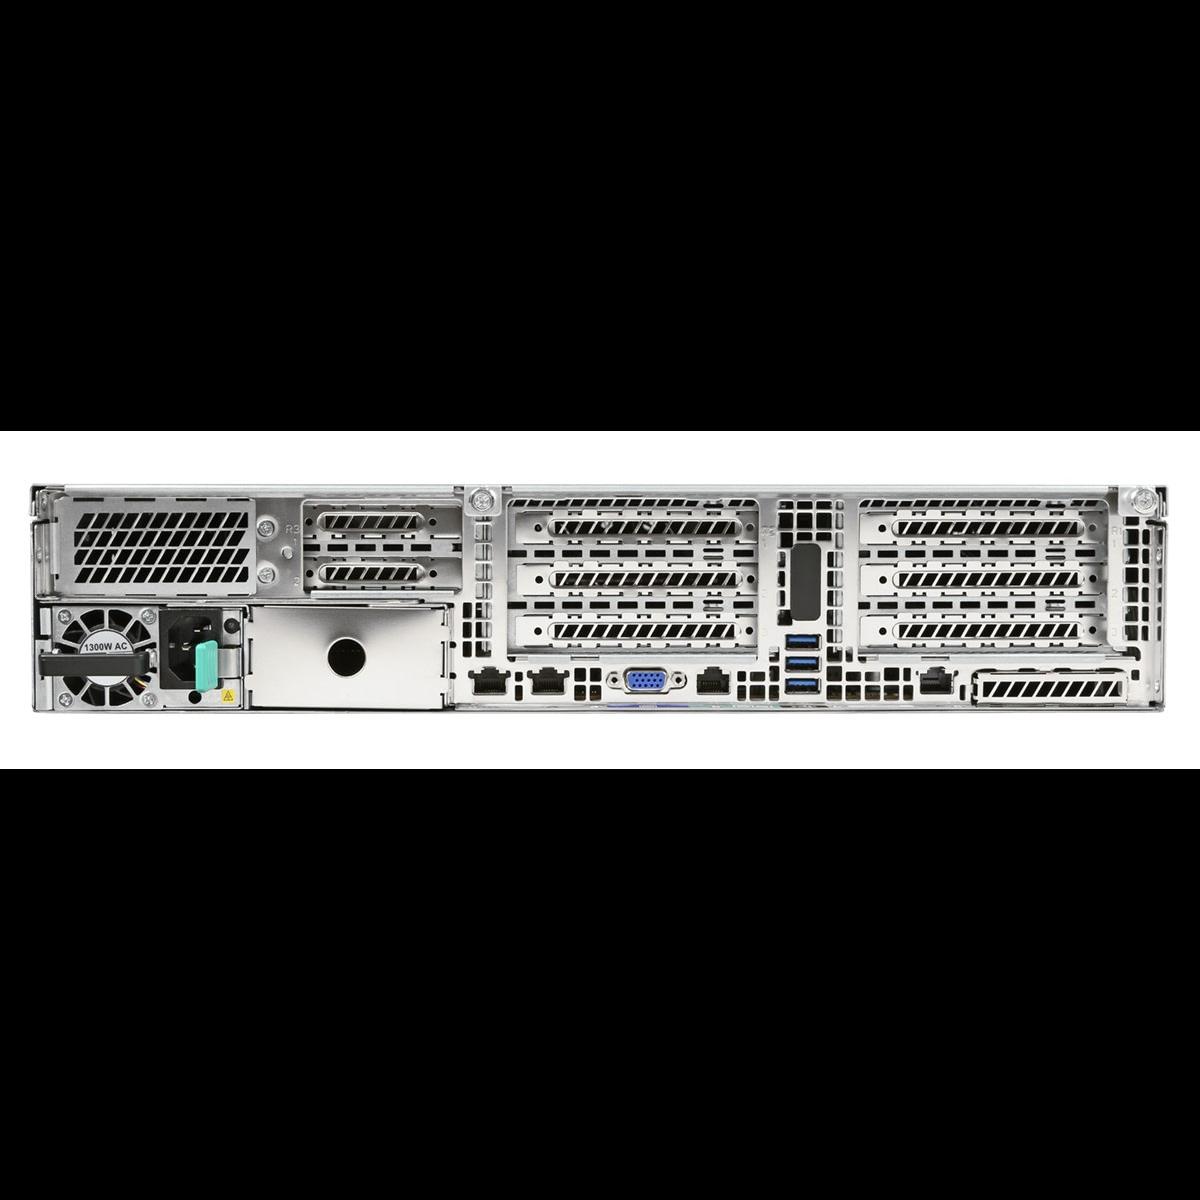 Серверная платформа Intel R2312WFTZSR 2U, до двух процессоров Intel Scalable, 24xDDR4, 12x3.5 HDD, 2x10Gb Base-T, 2xM.2 PCI-Ex4, 2x1300W PSU